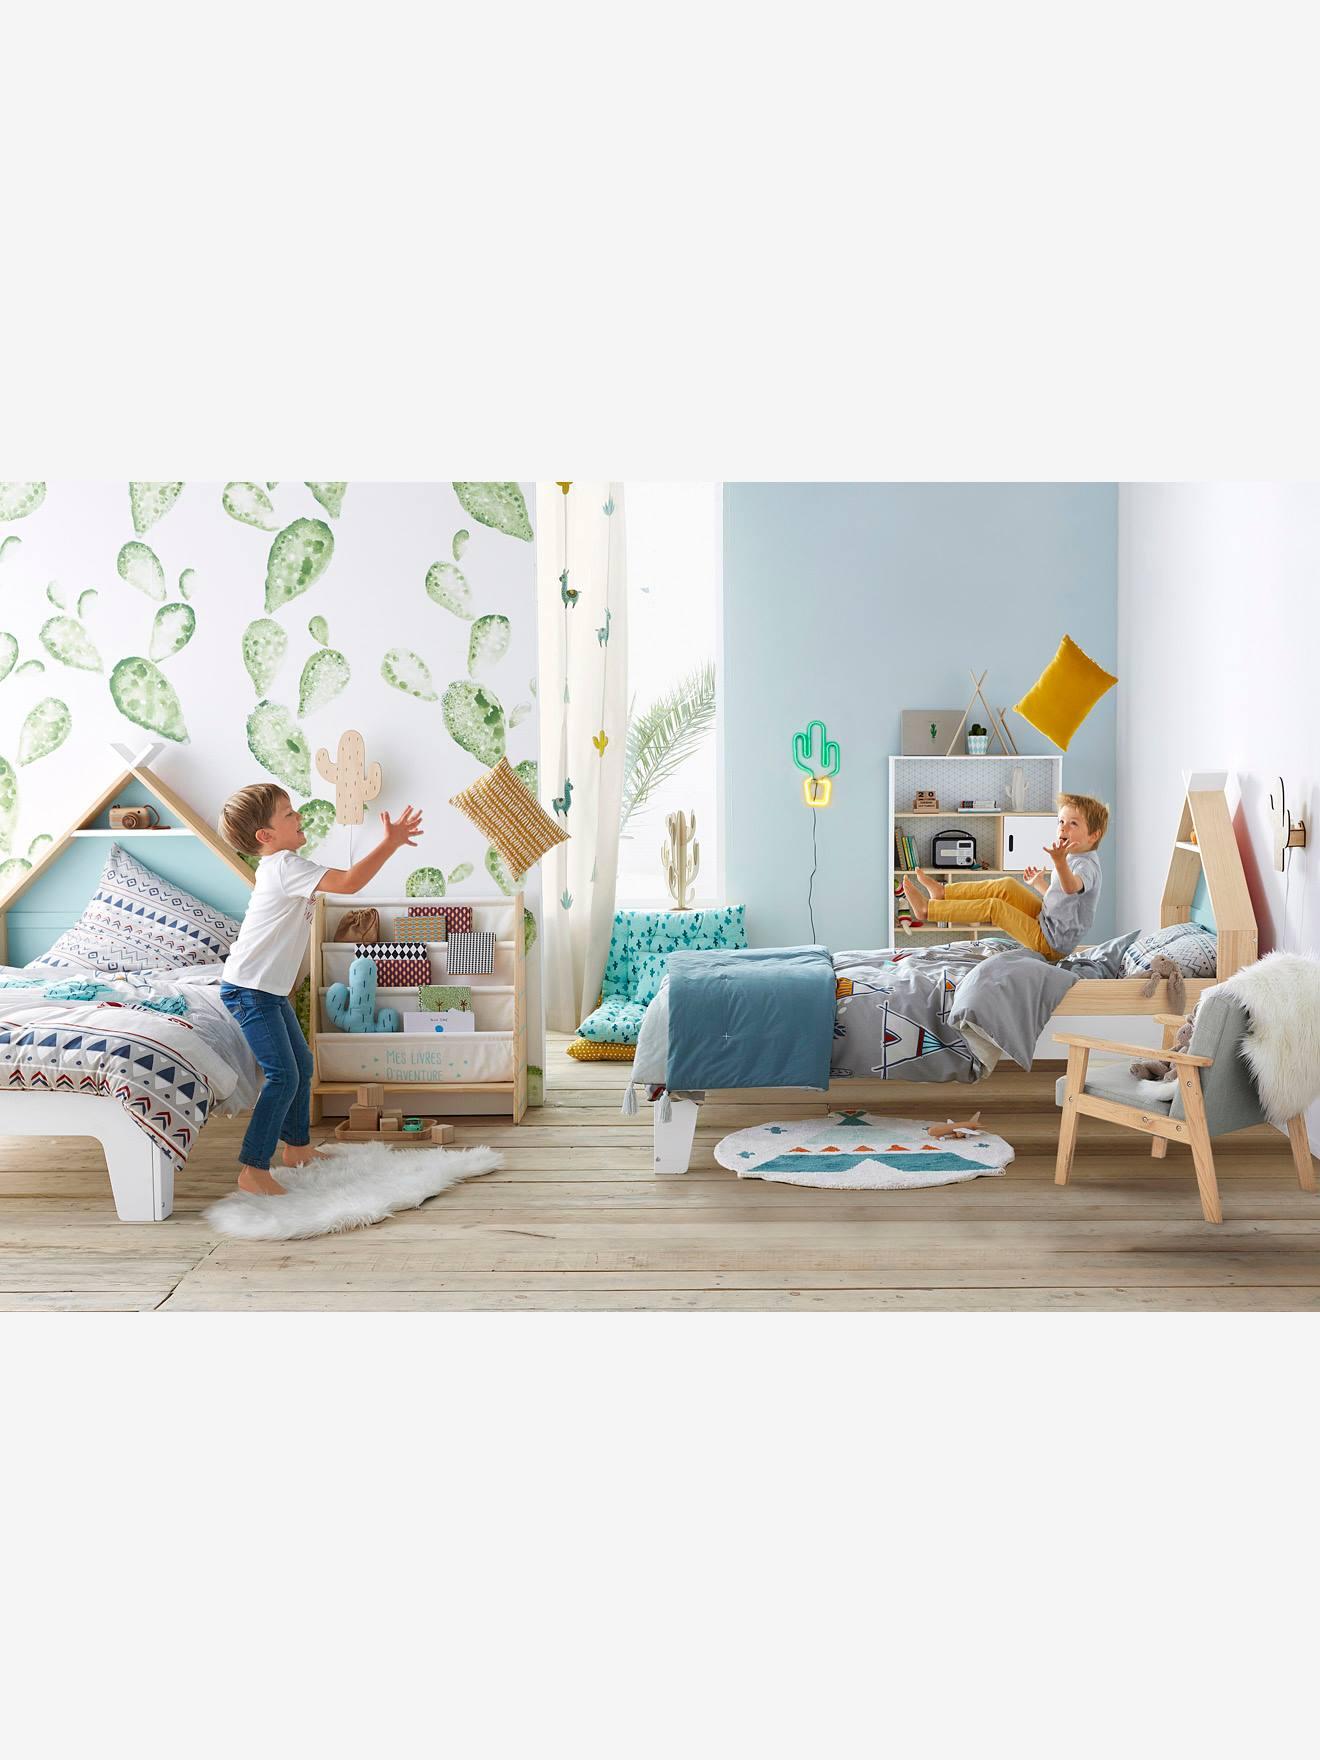 Nett Kinderzimmer Kissenecke Fotos - Schlafzimmer Ideen - losviajes.info